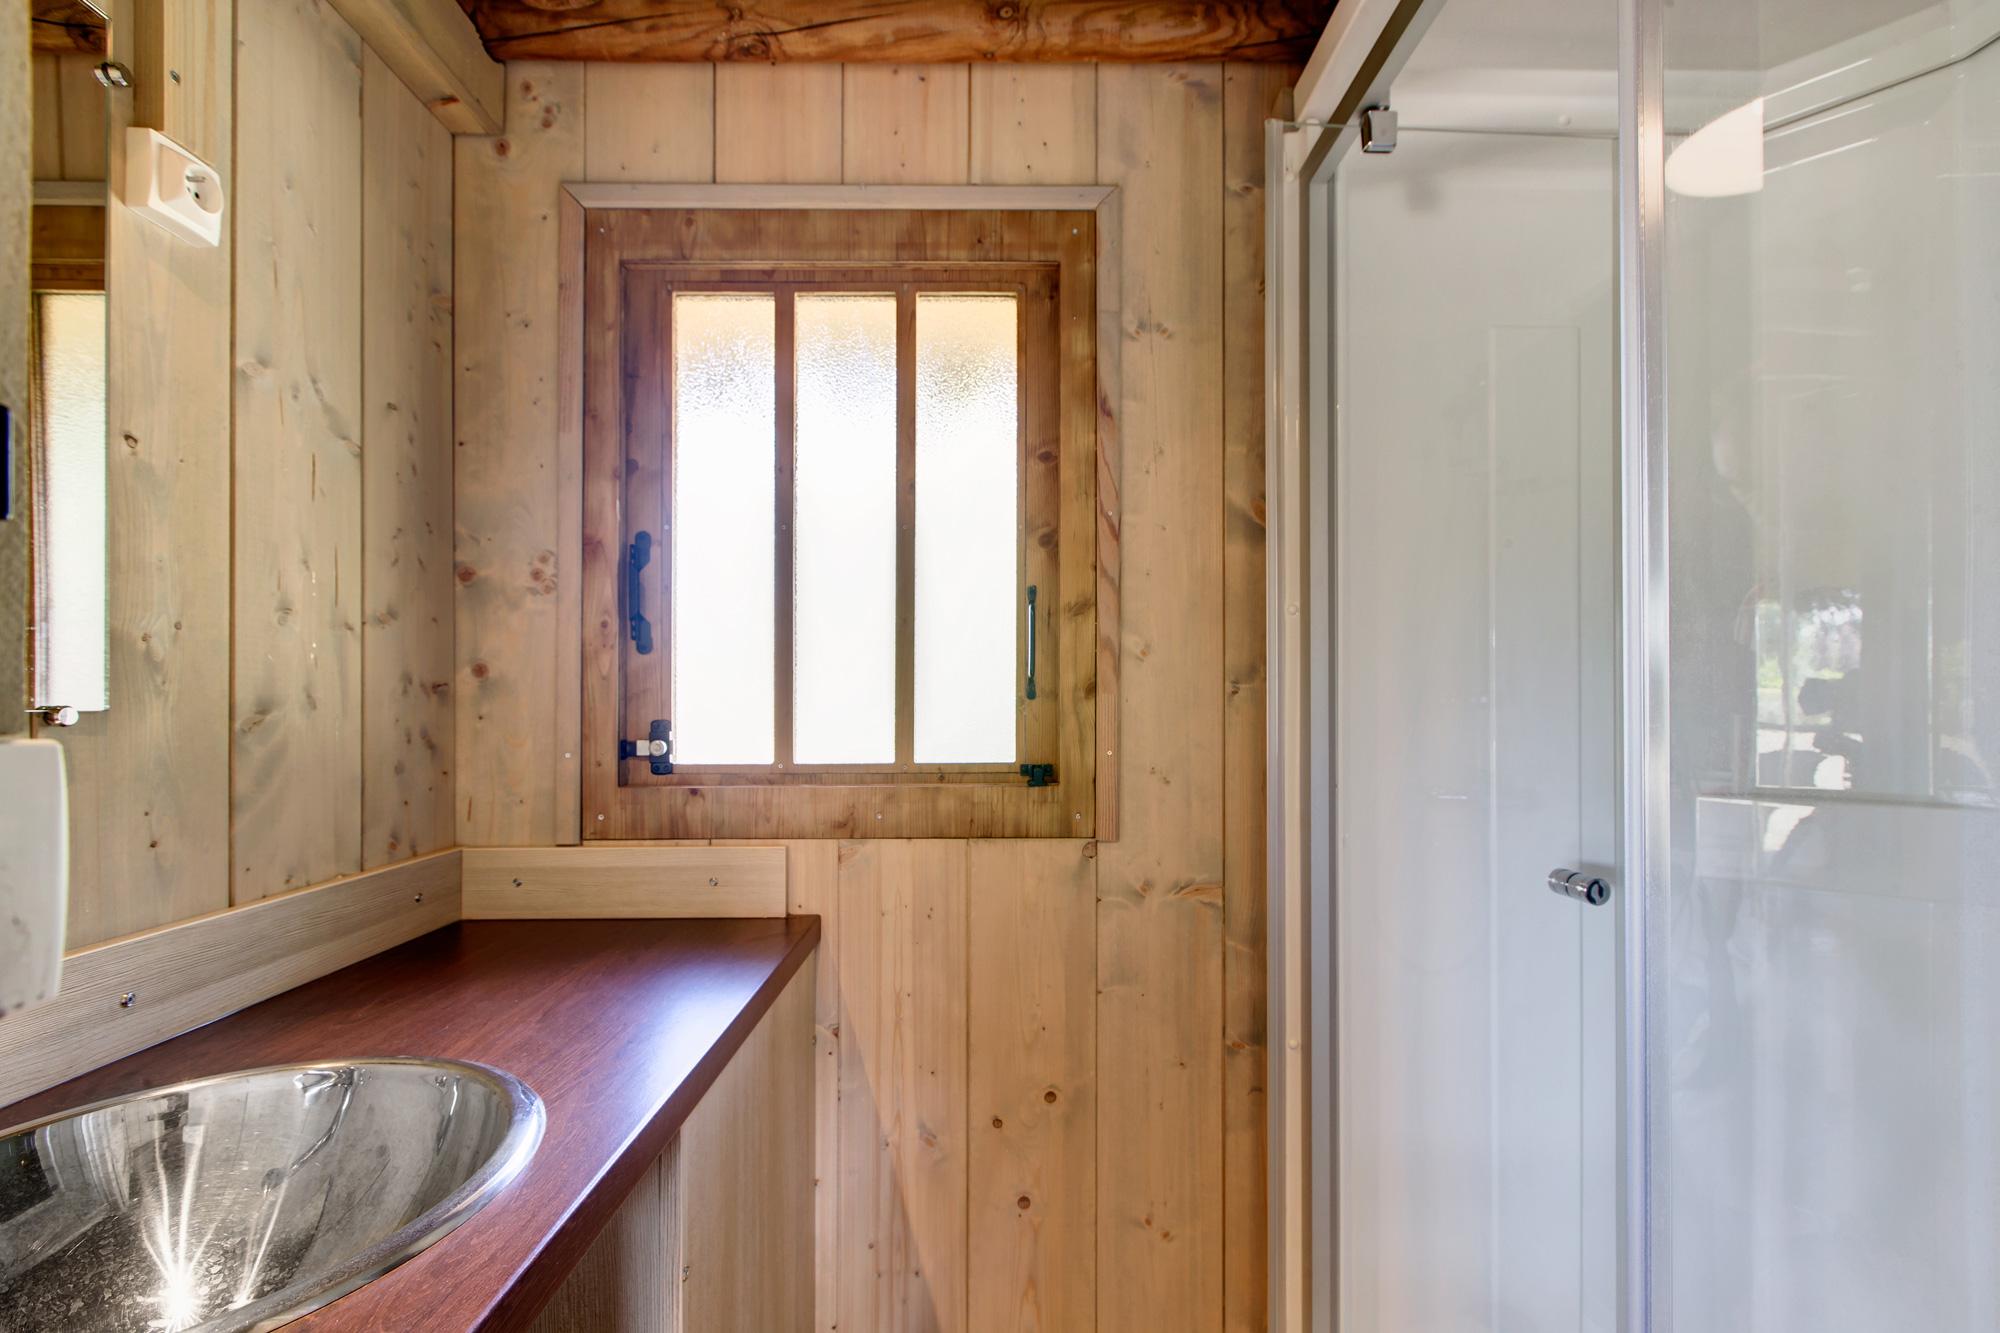 Location de vacances Cabanes Lodges 2 Chambres – Grand Confort €